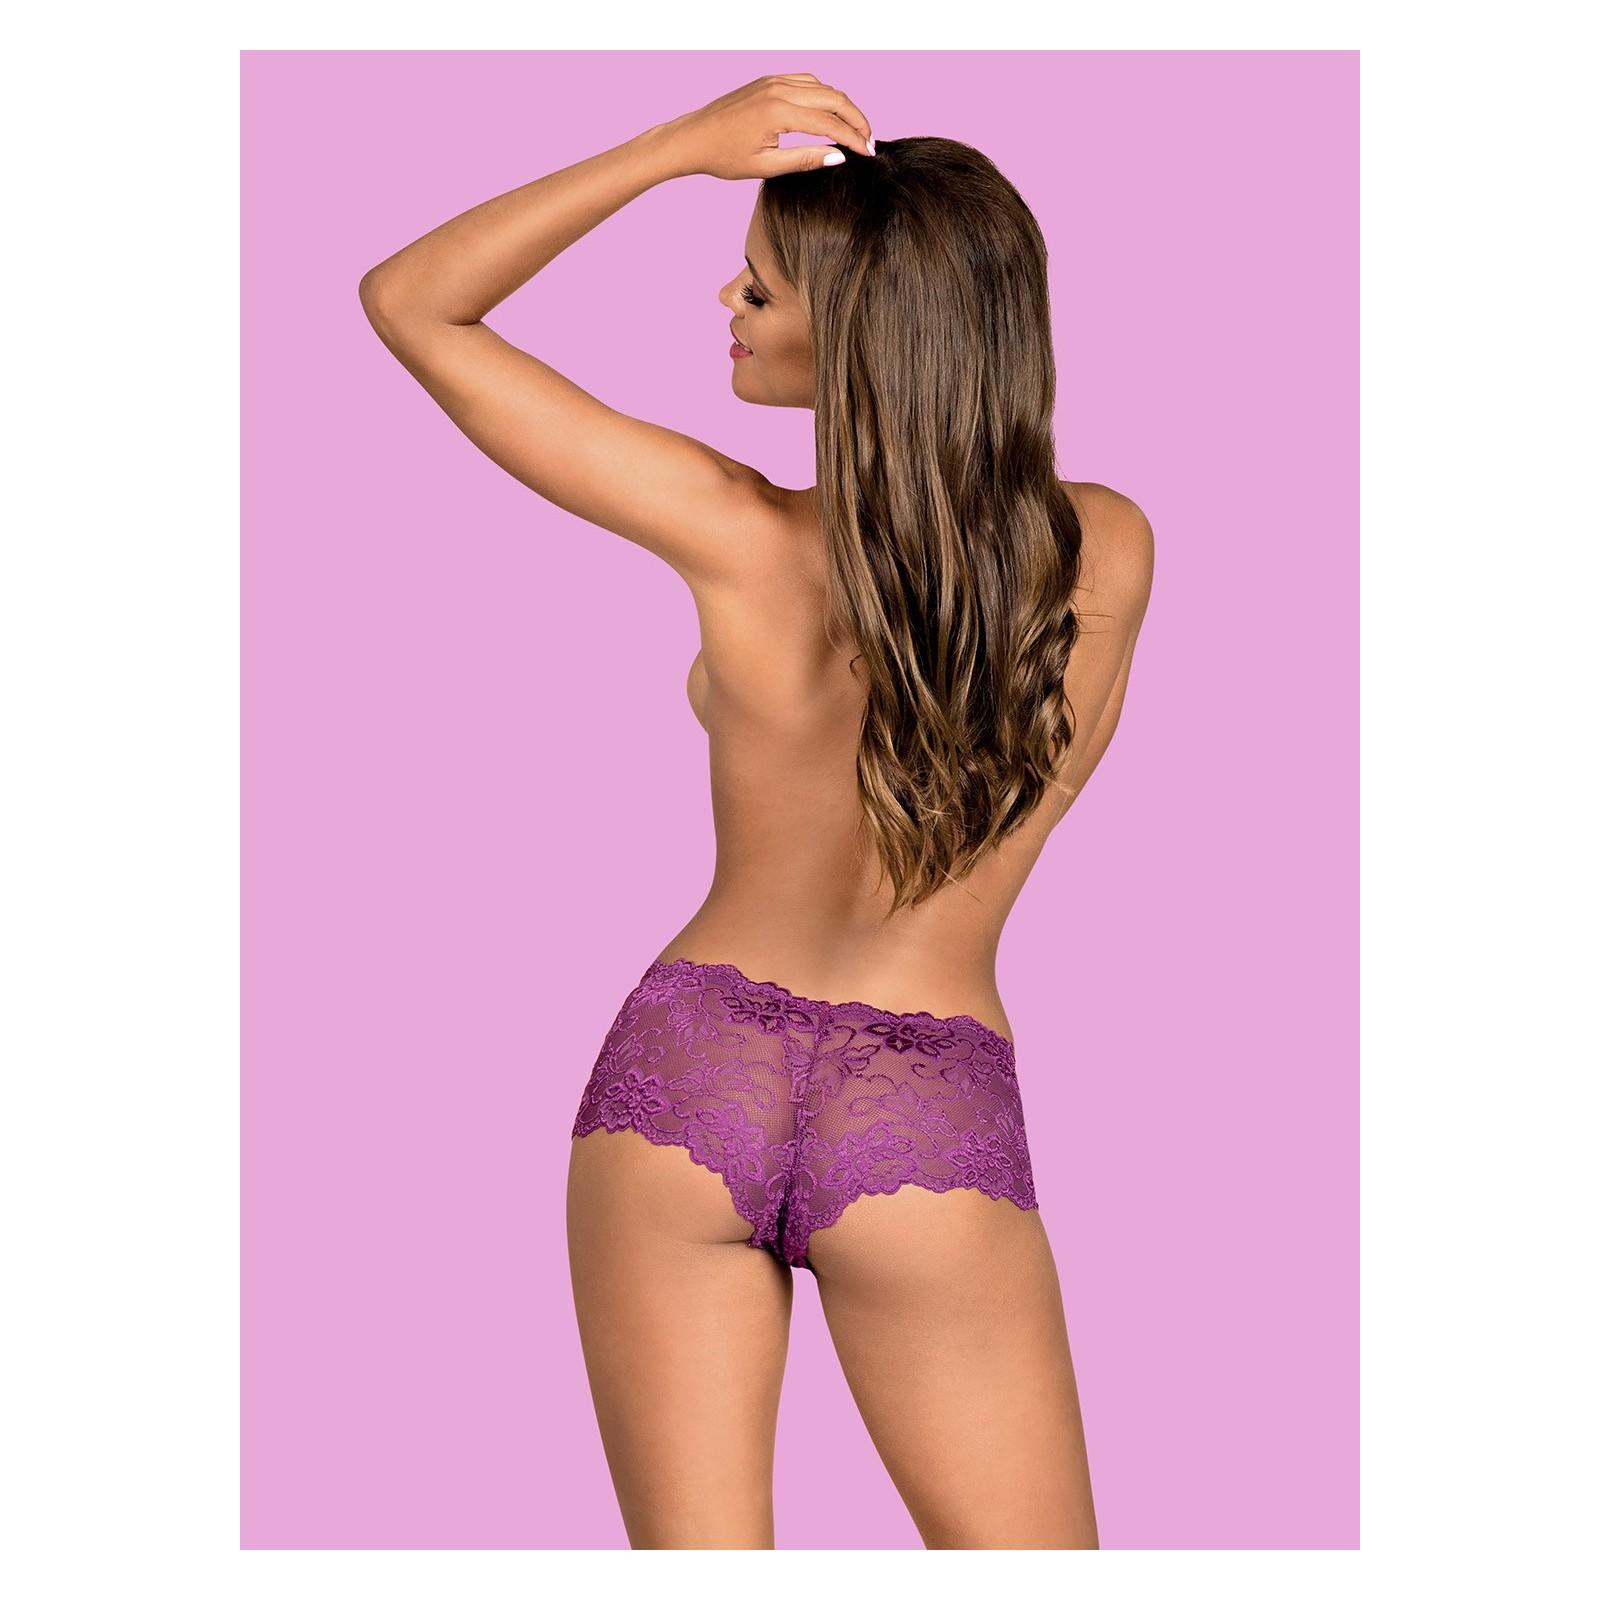 Idillia Shorties purple - 4 - Vorschaubild